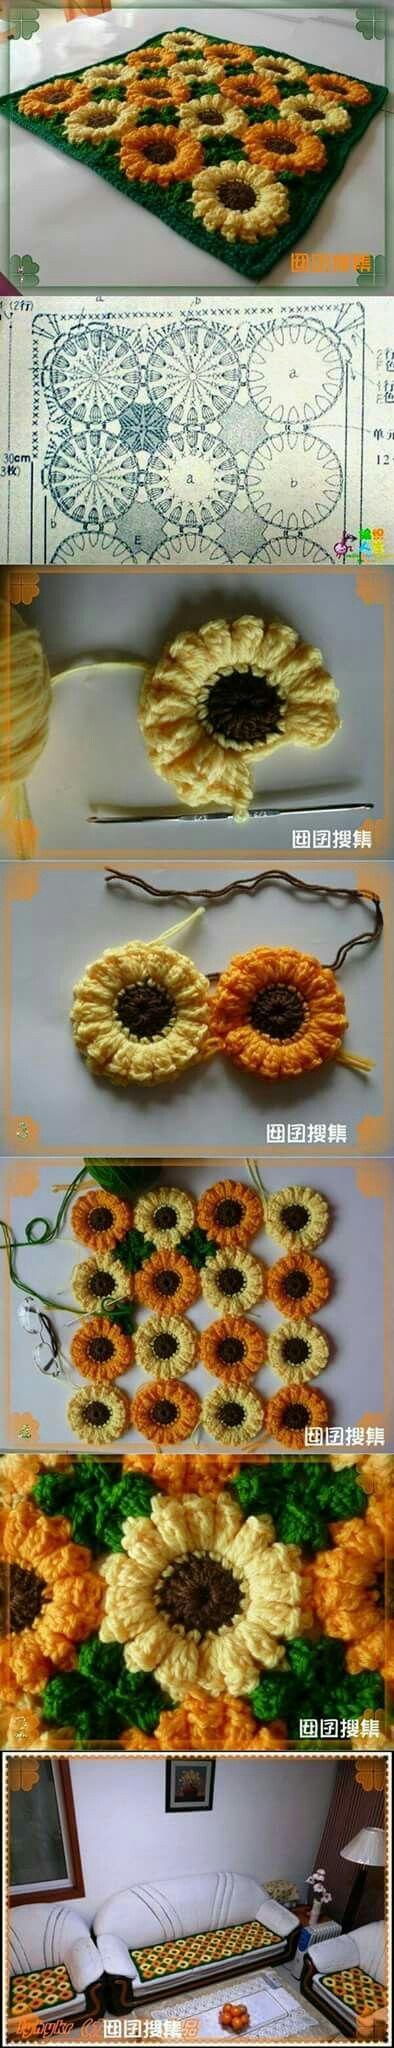 Patrón girasoles   Crochet   Pinterest   Girasoles, Patrones y Tejido